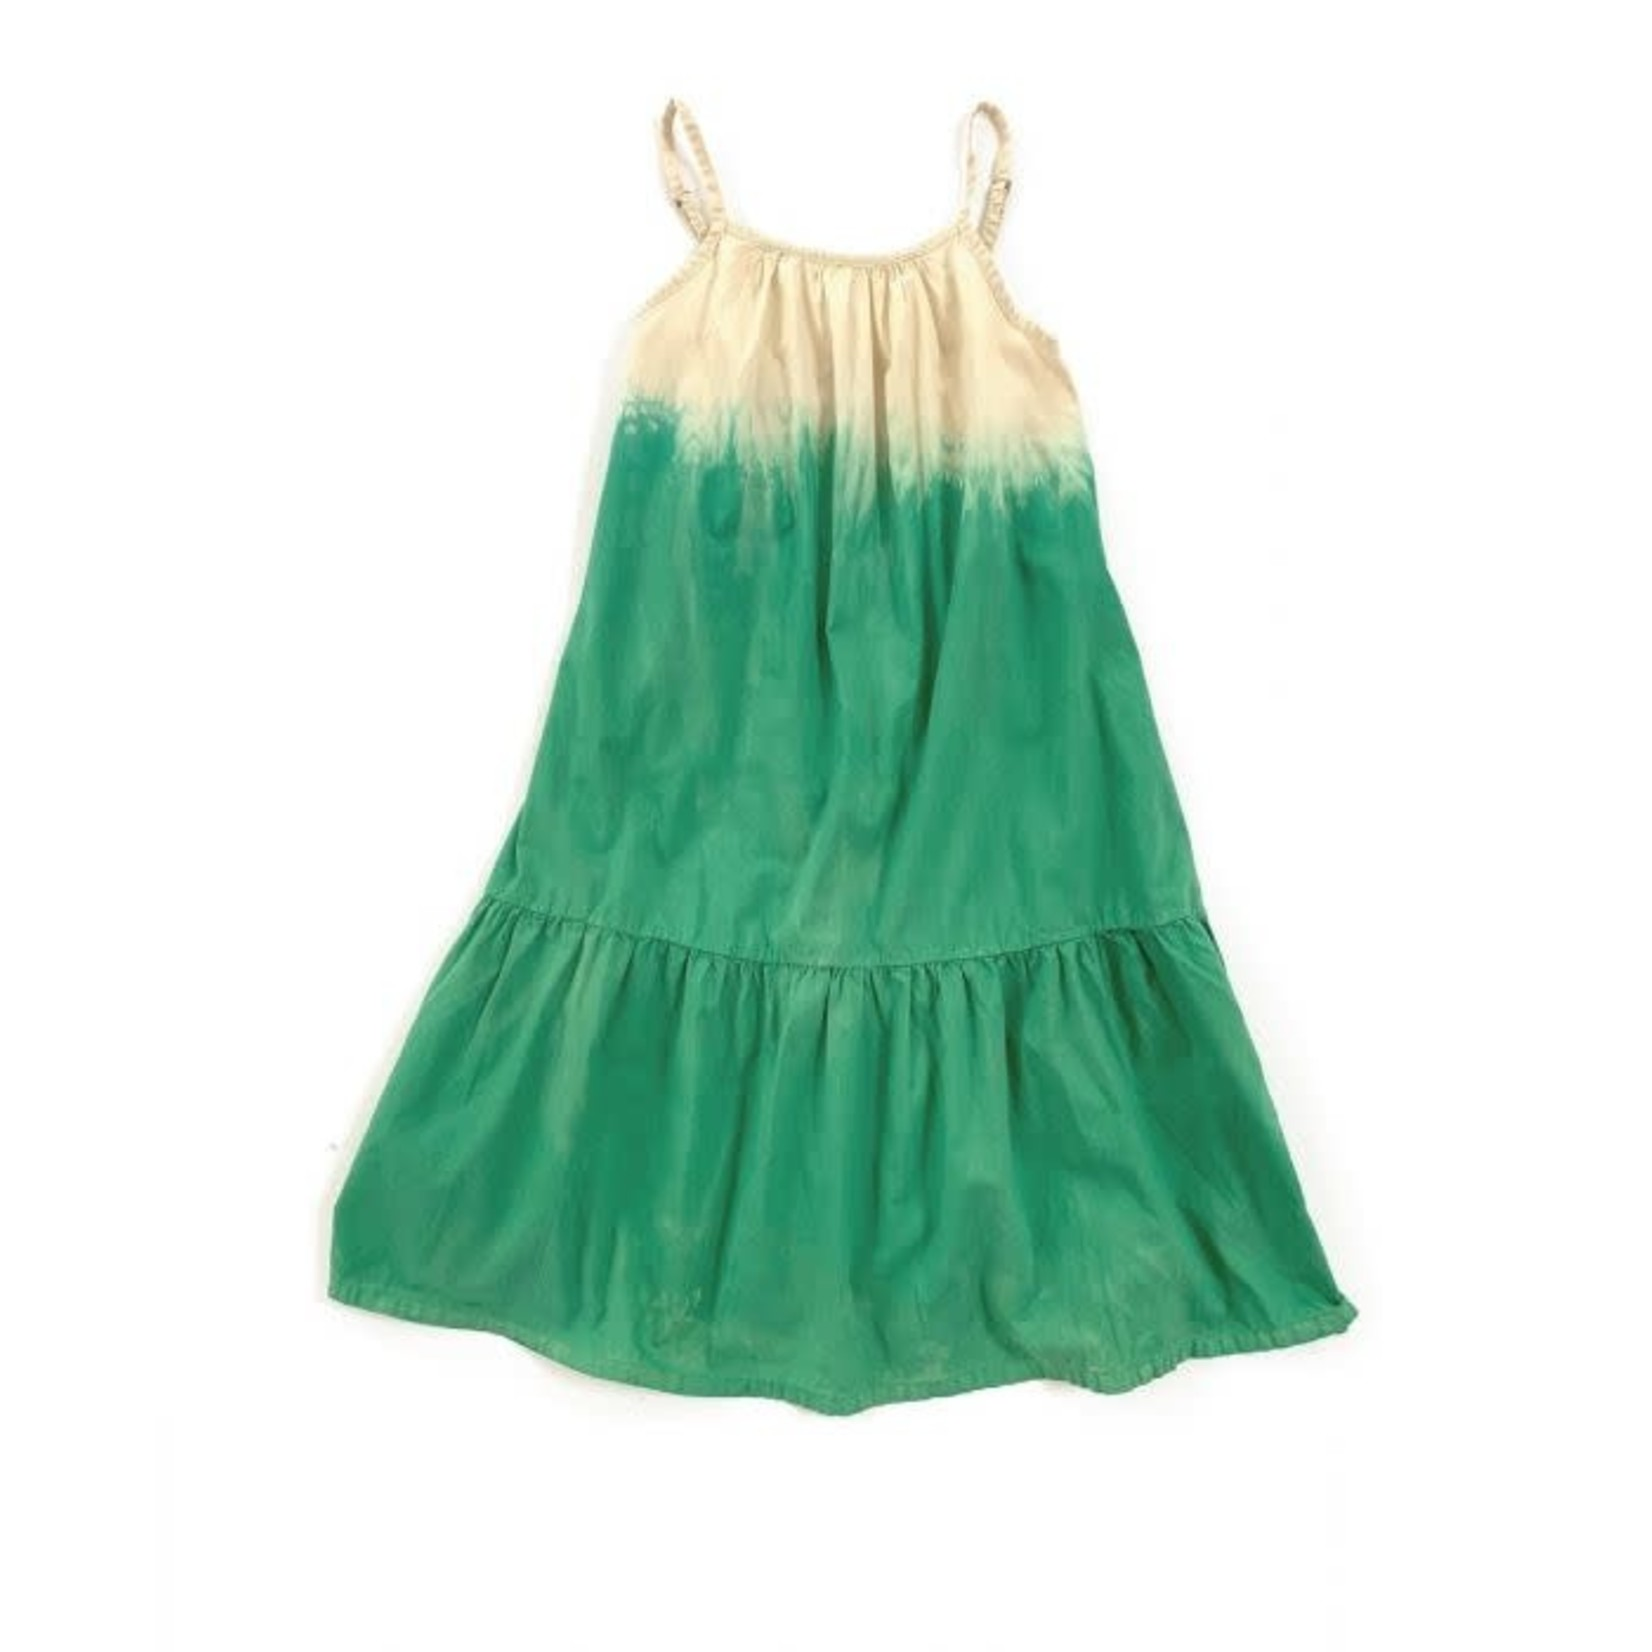 LONG LIVE THE QUEEN LONGLIVETHEQUEEN wide dress green